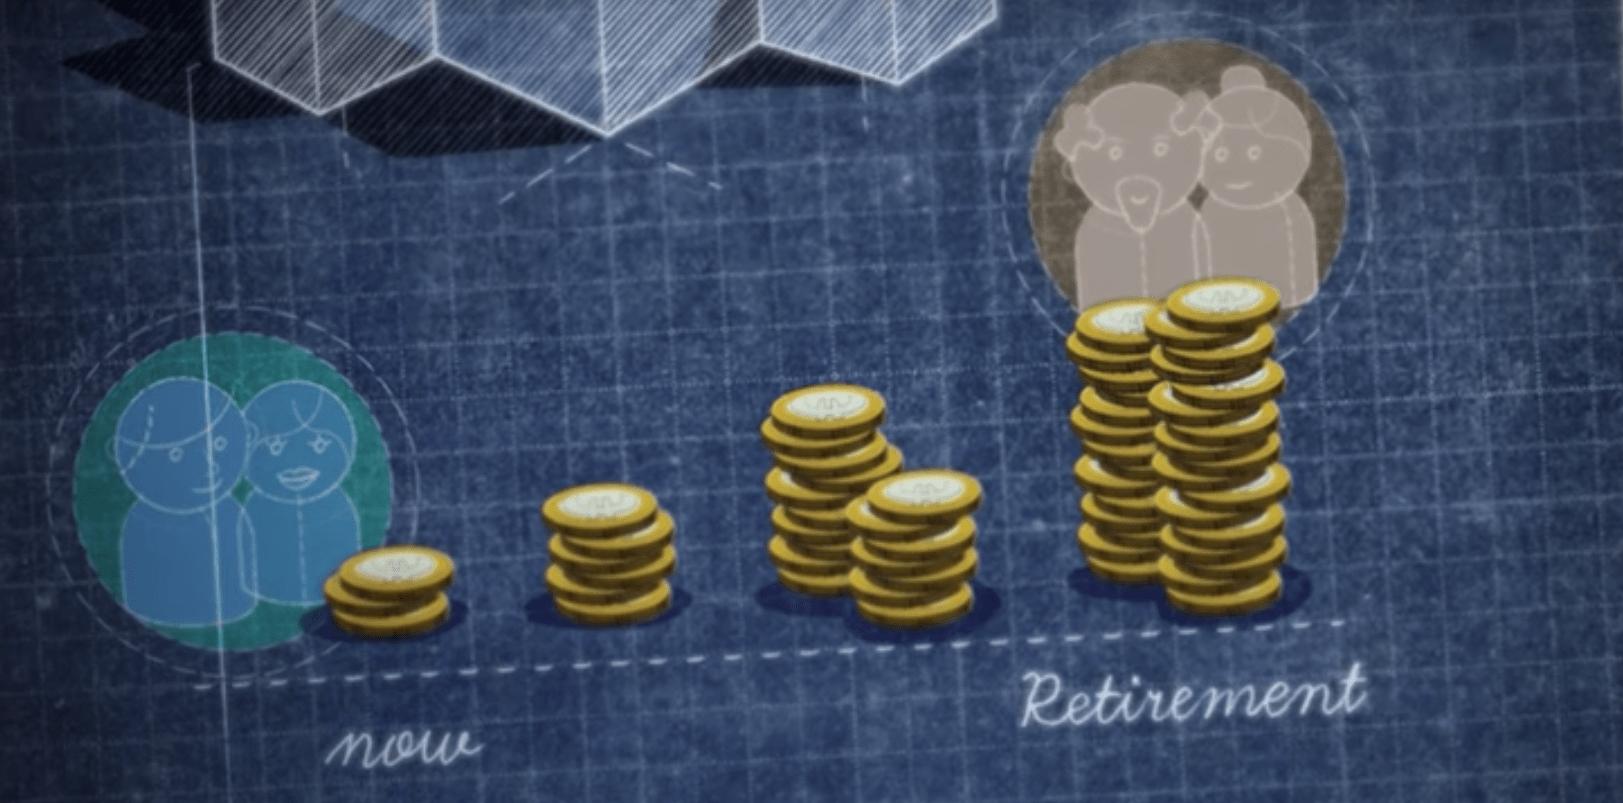 pensions- savings